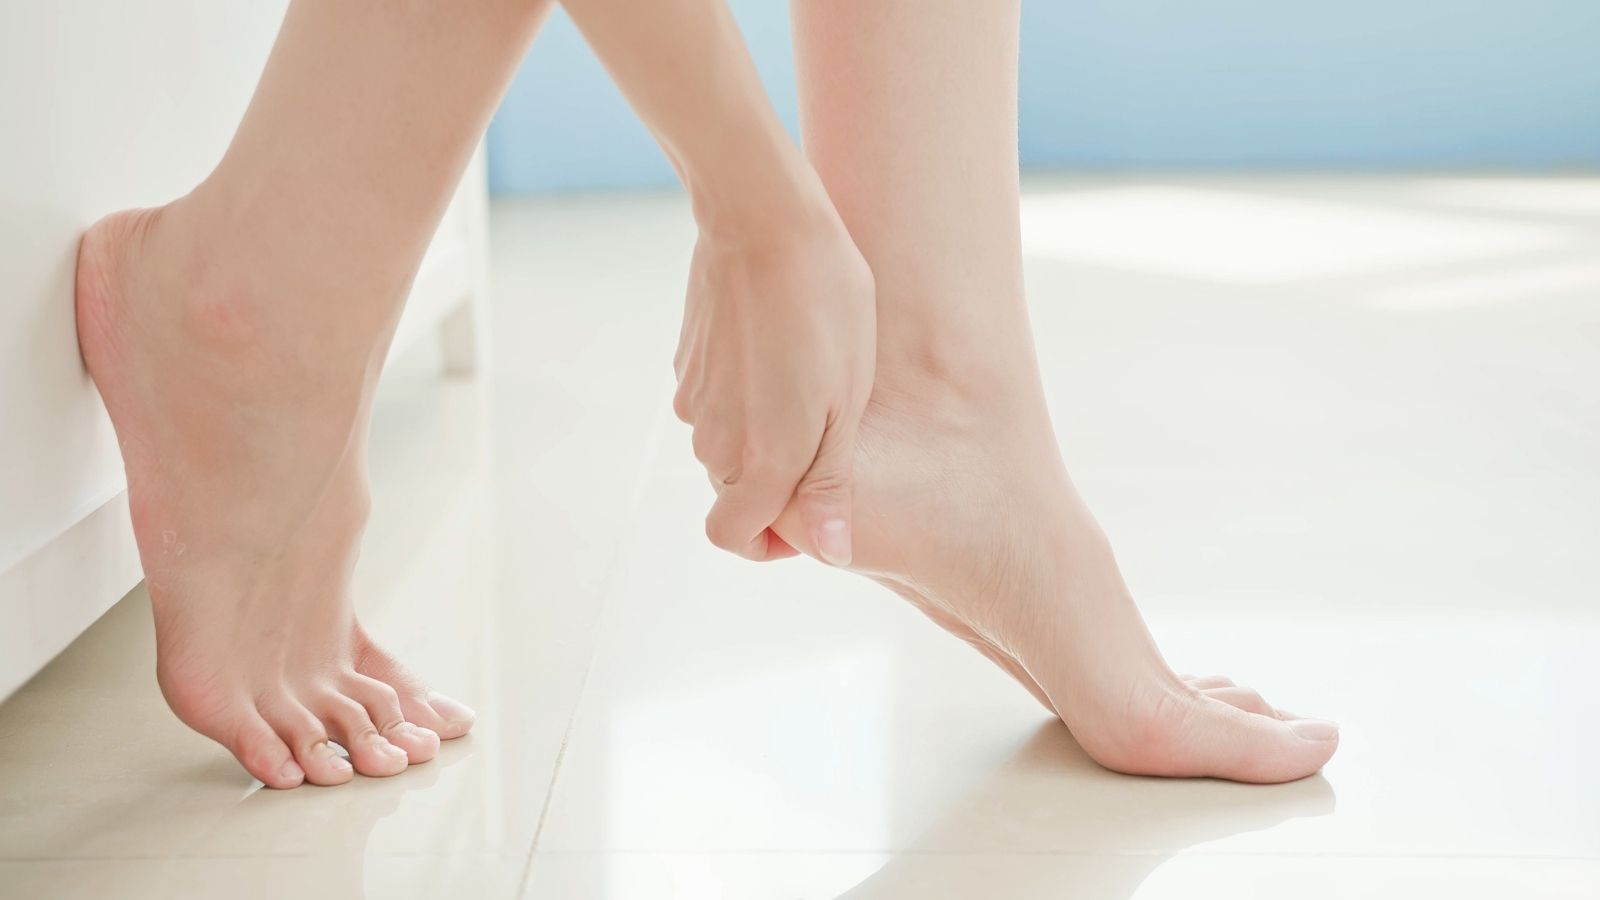 Moisturise your feet regularly